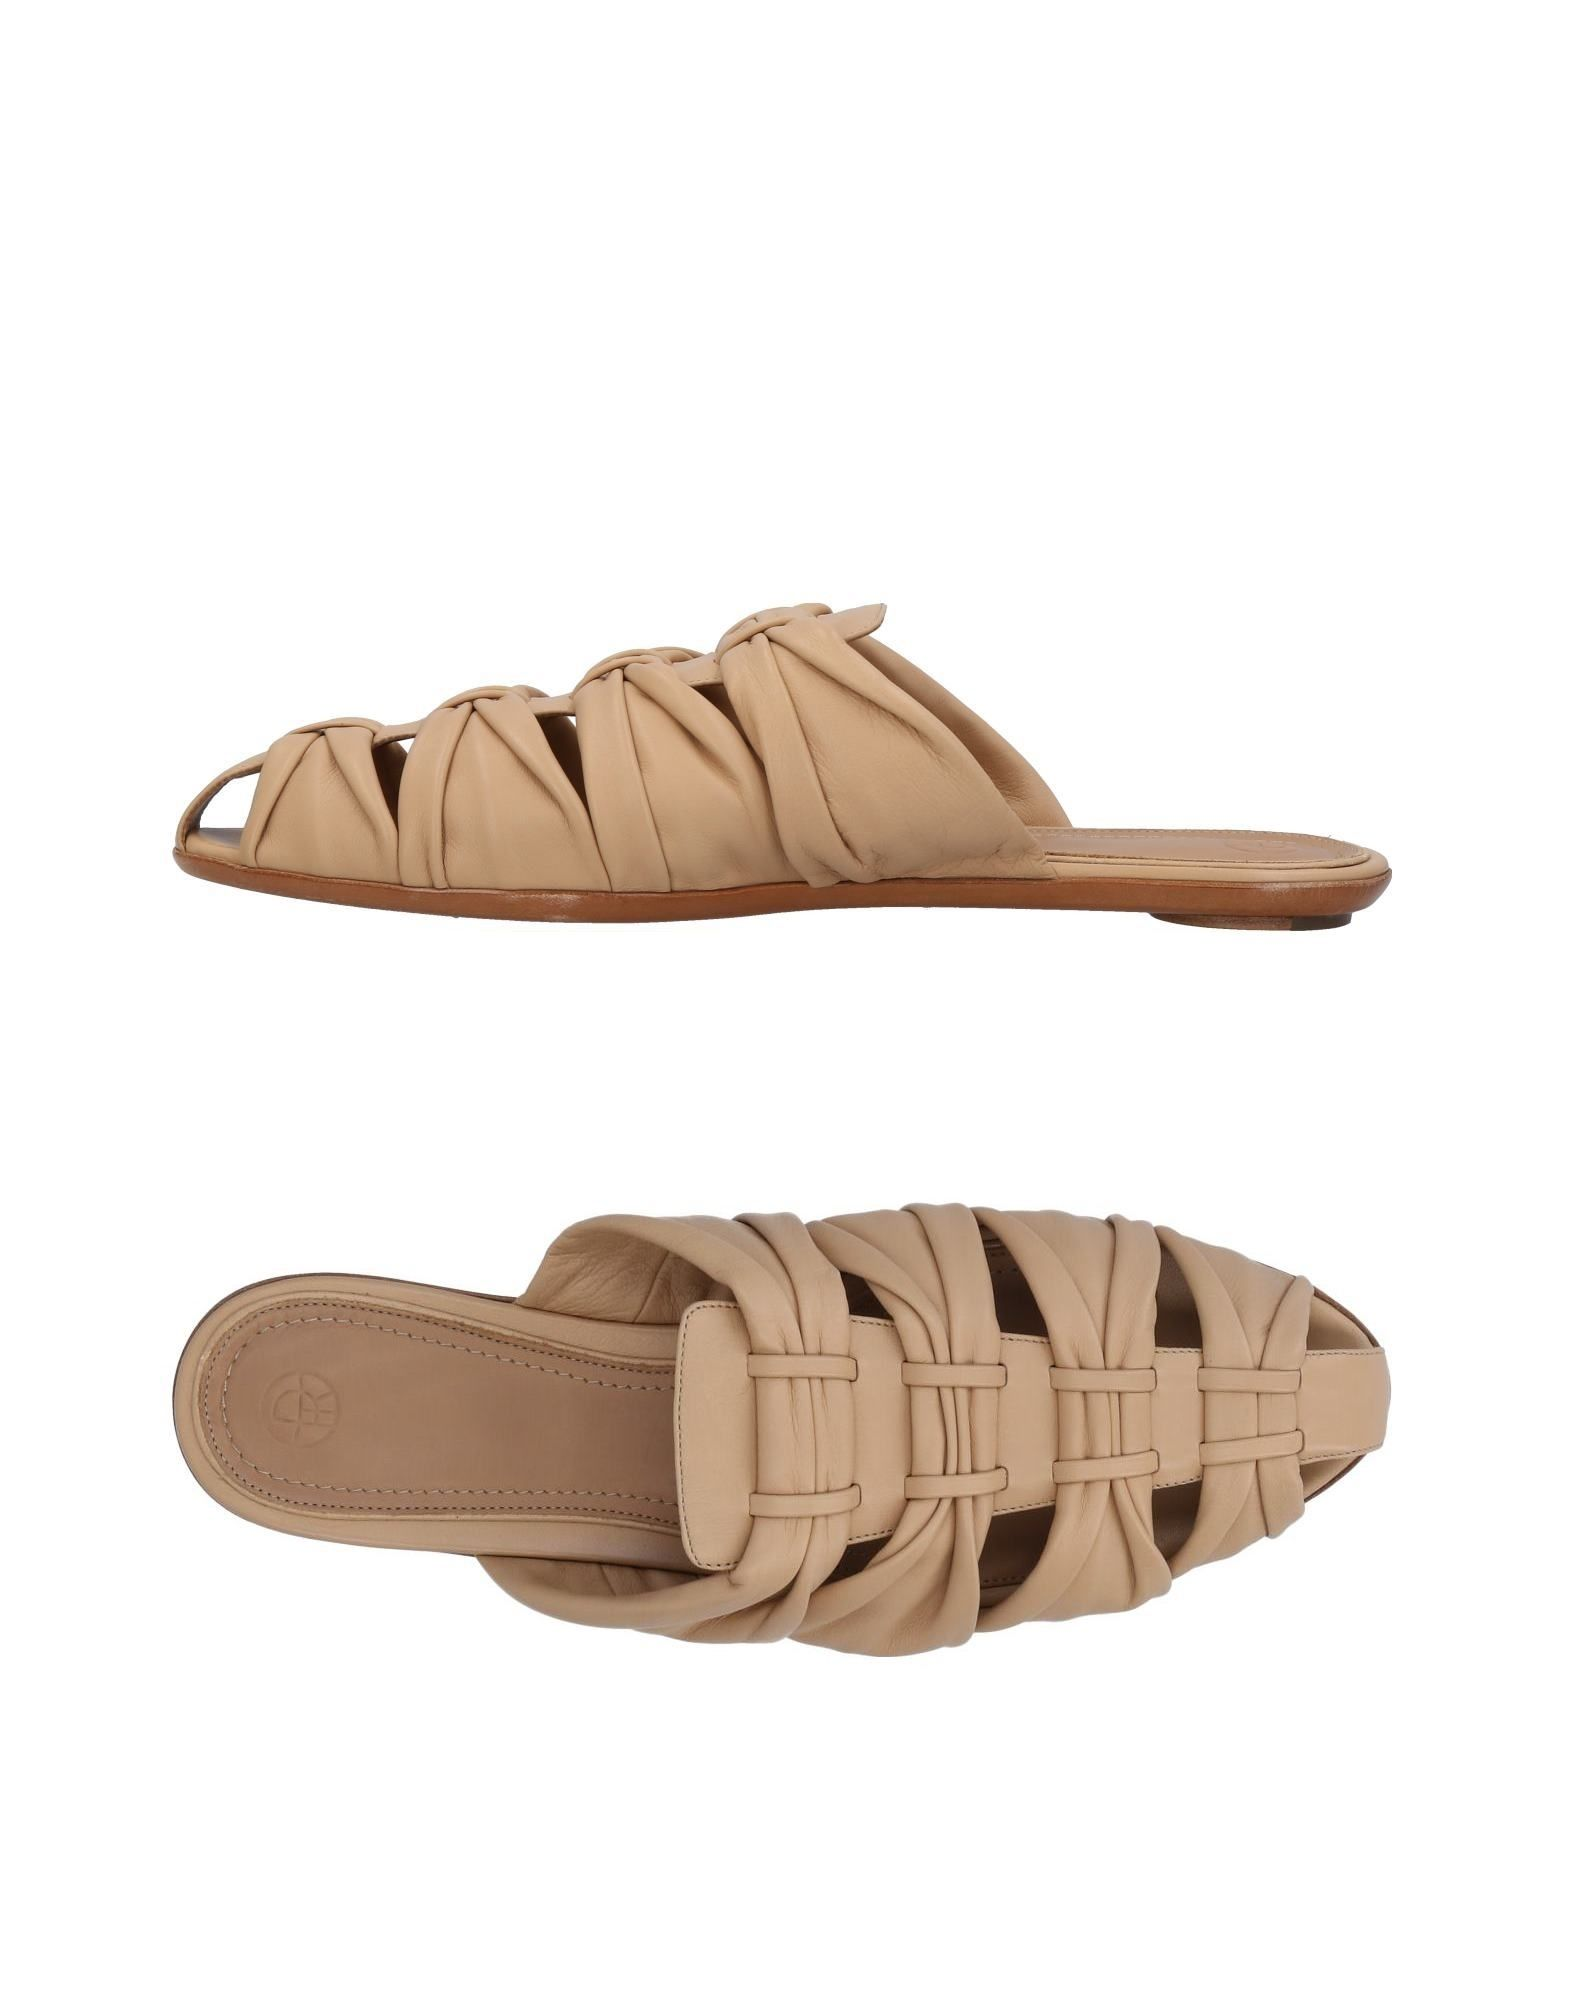 The Row Pantoletten aussehende Damen  11454159UJGünstige gut aussehende Pantoletten Schuhe 8efa09